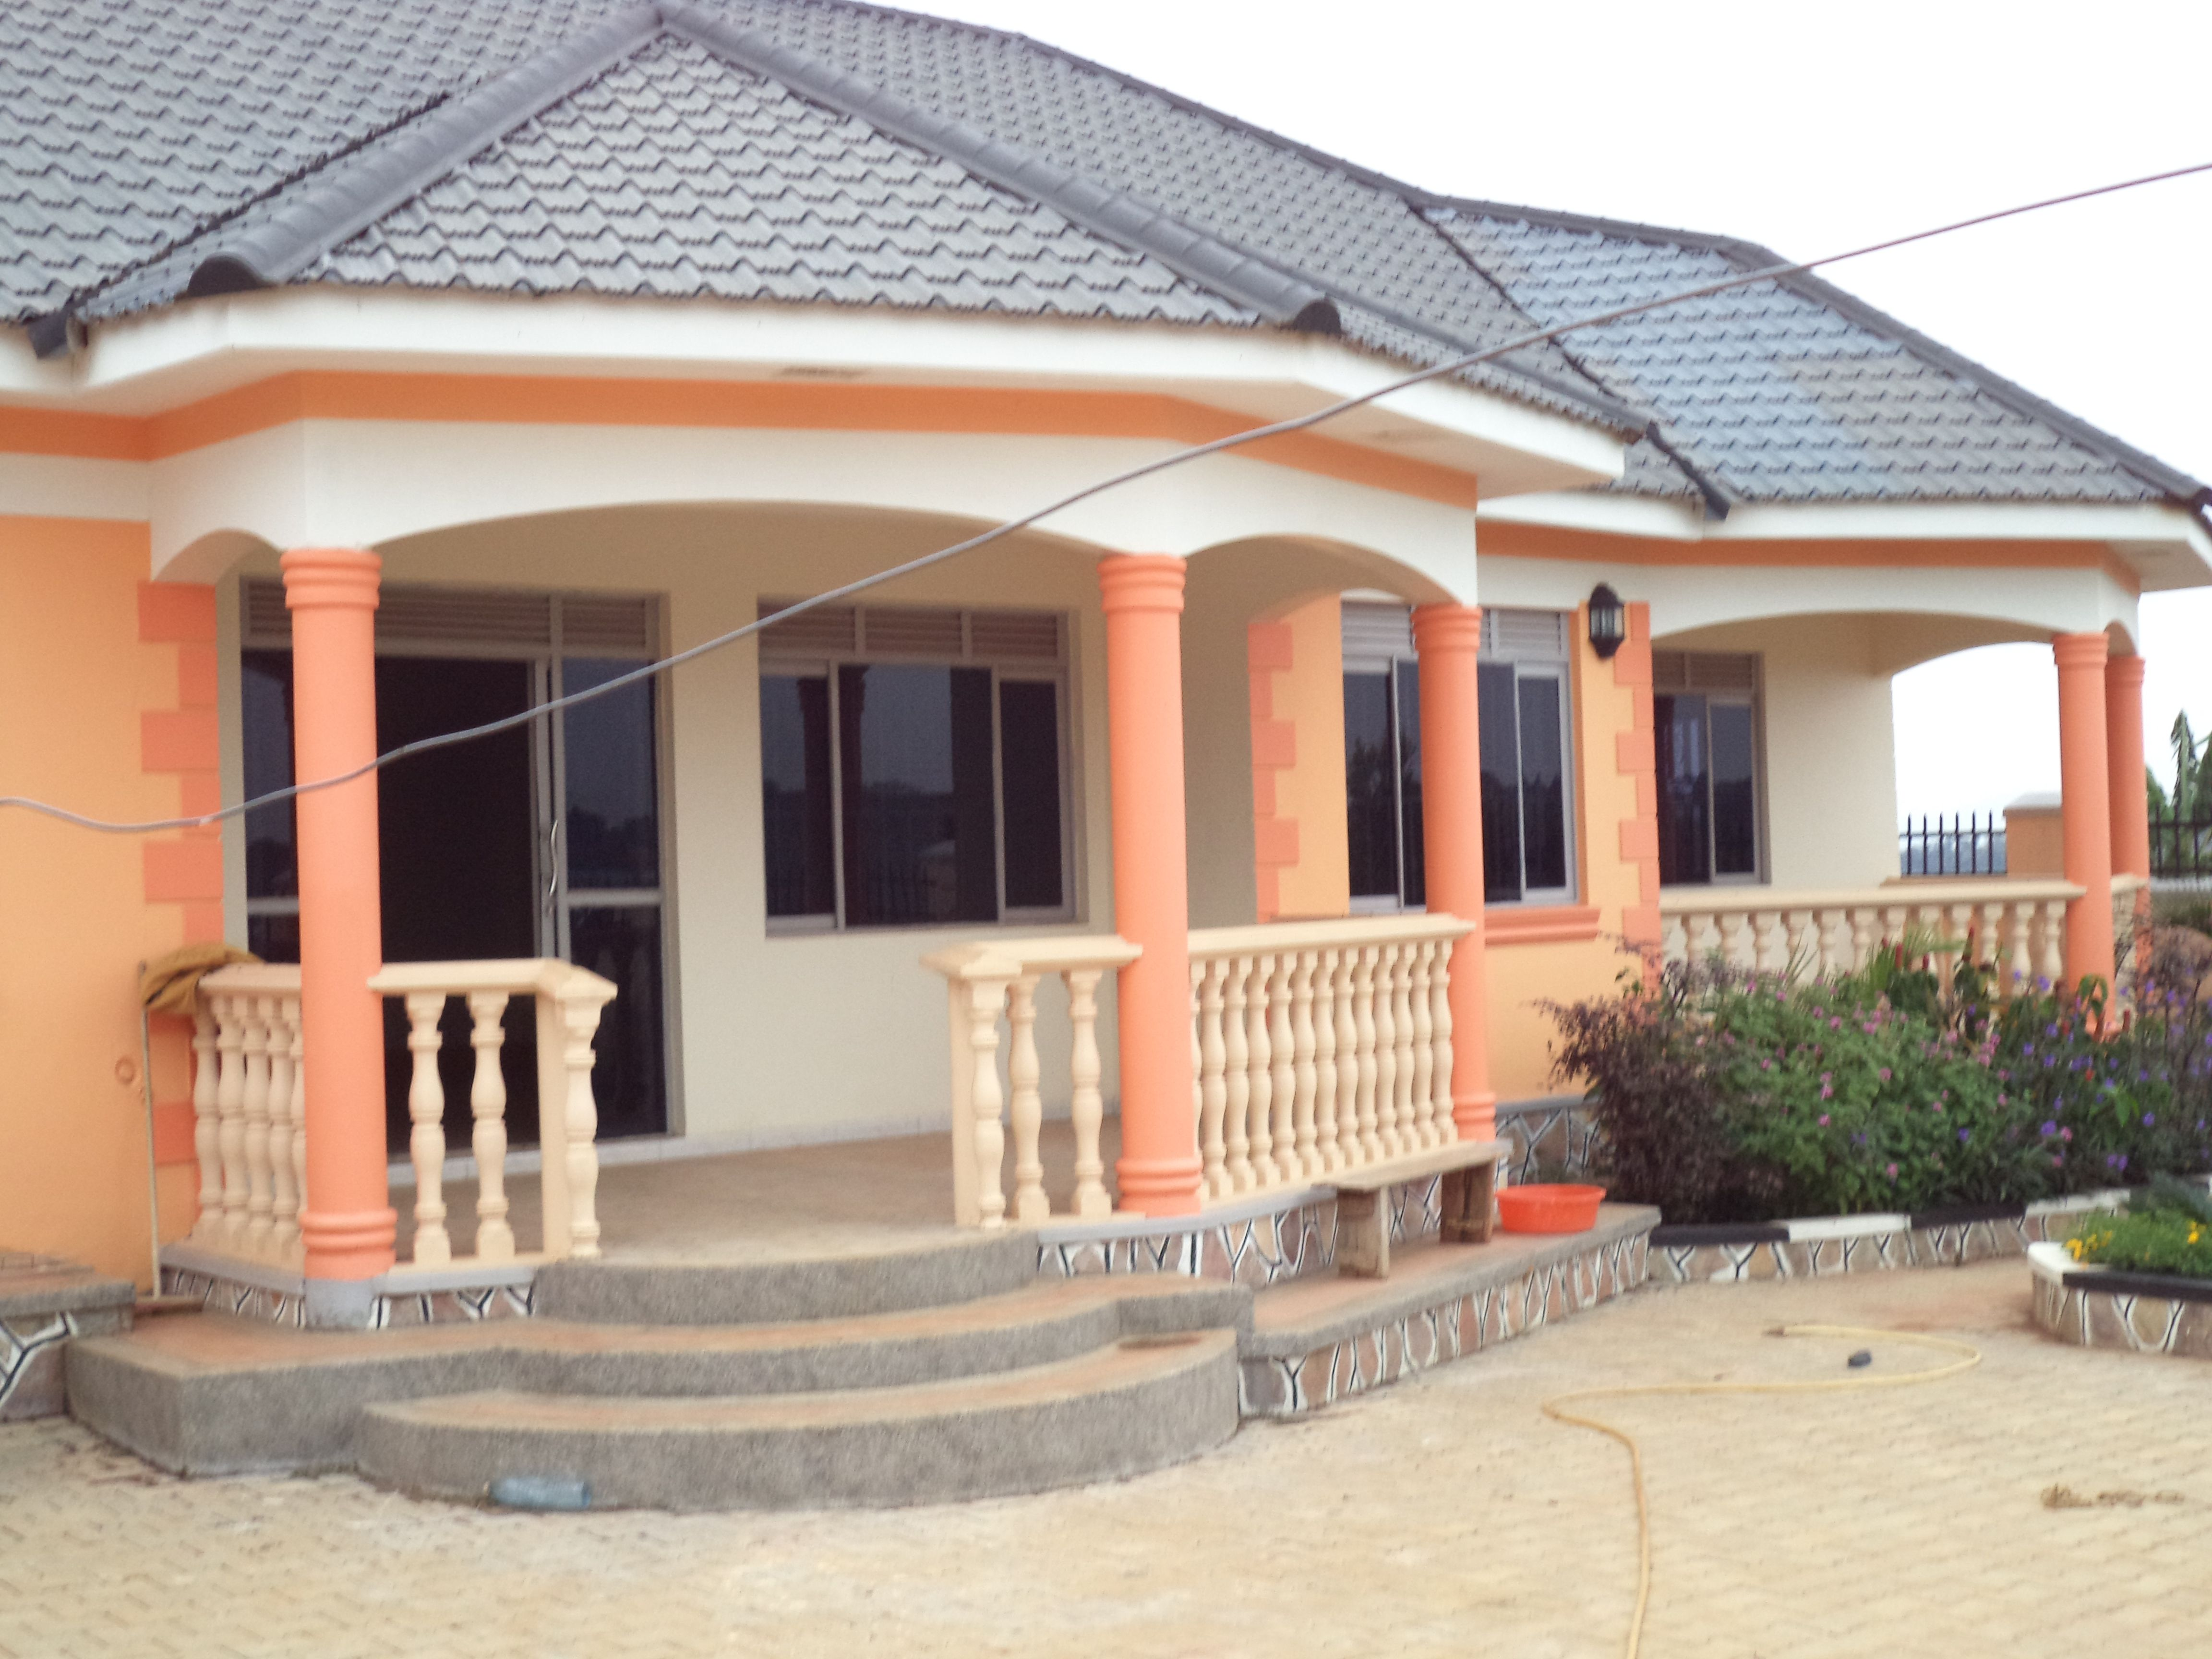 Winning House Designs In Uganda Homedesignsinuganda Housedesignsimagesinuganda Housedesignsinuganda H My House Plans Modern House Plans House Layout Plans